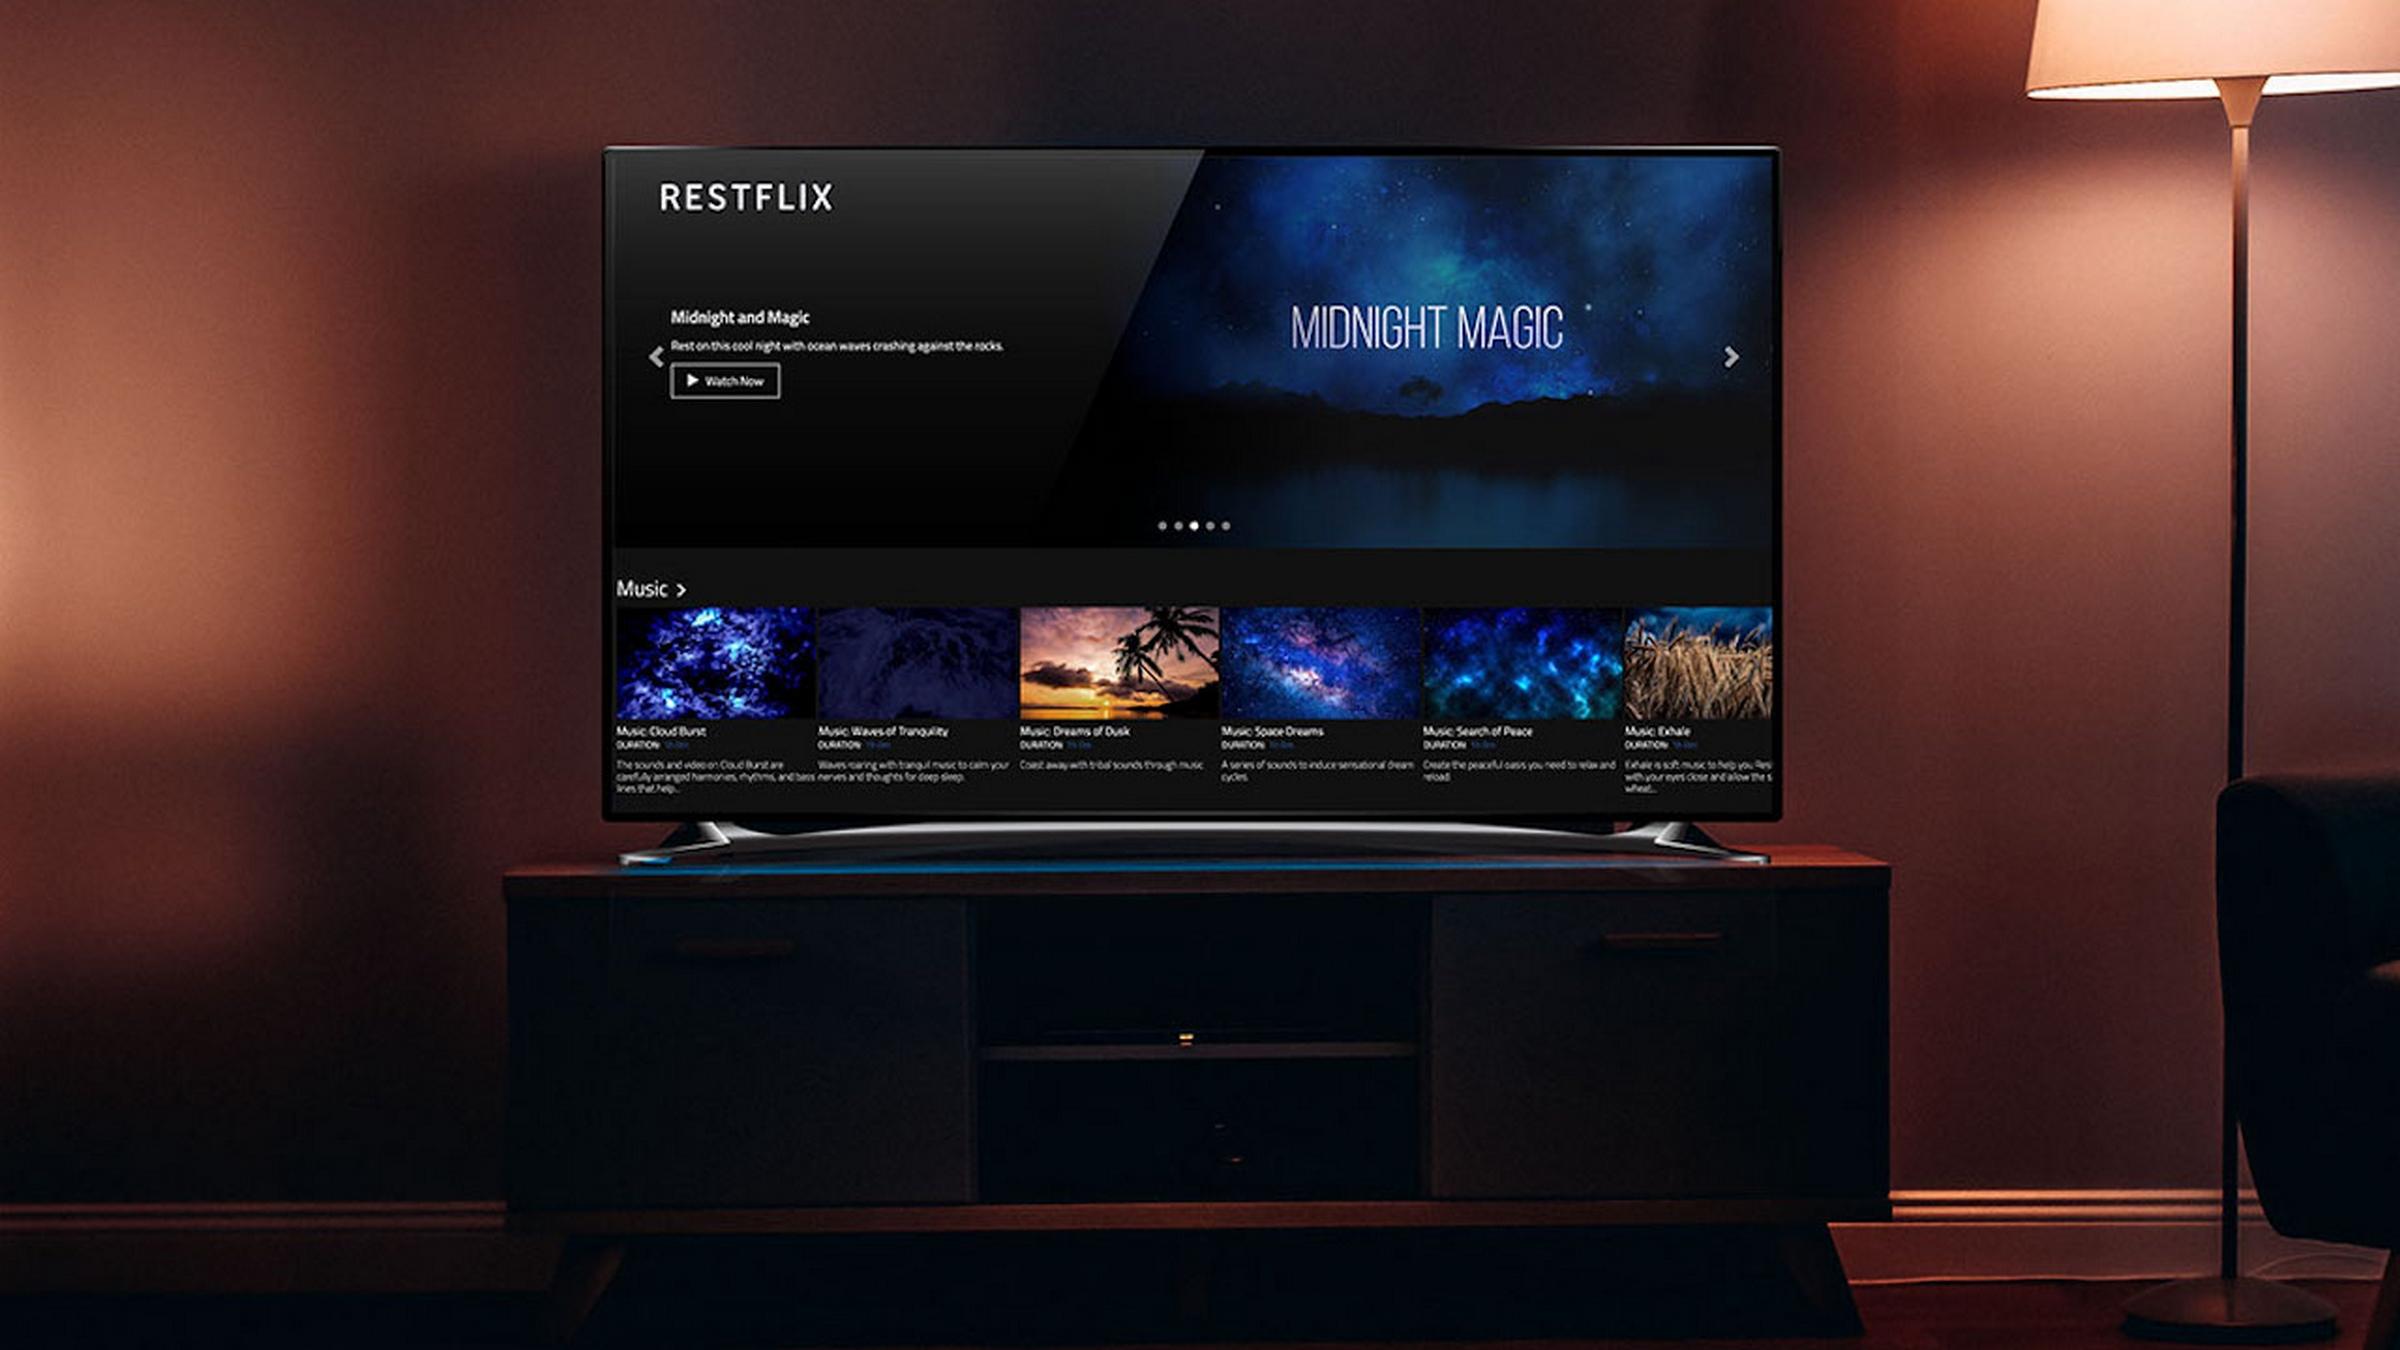 Ya está aquí Restflix, el Netflix para quedarse dormido | Entretenimiento -  ComputerHoy.com